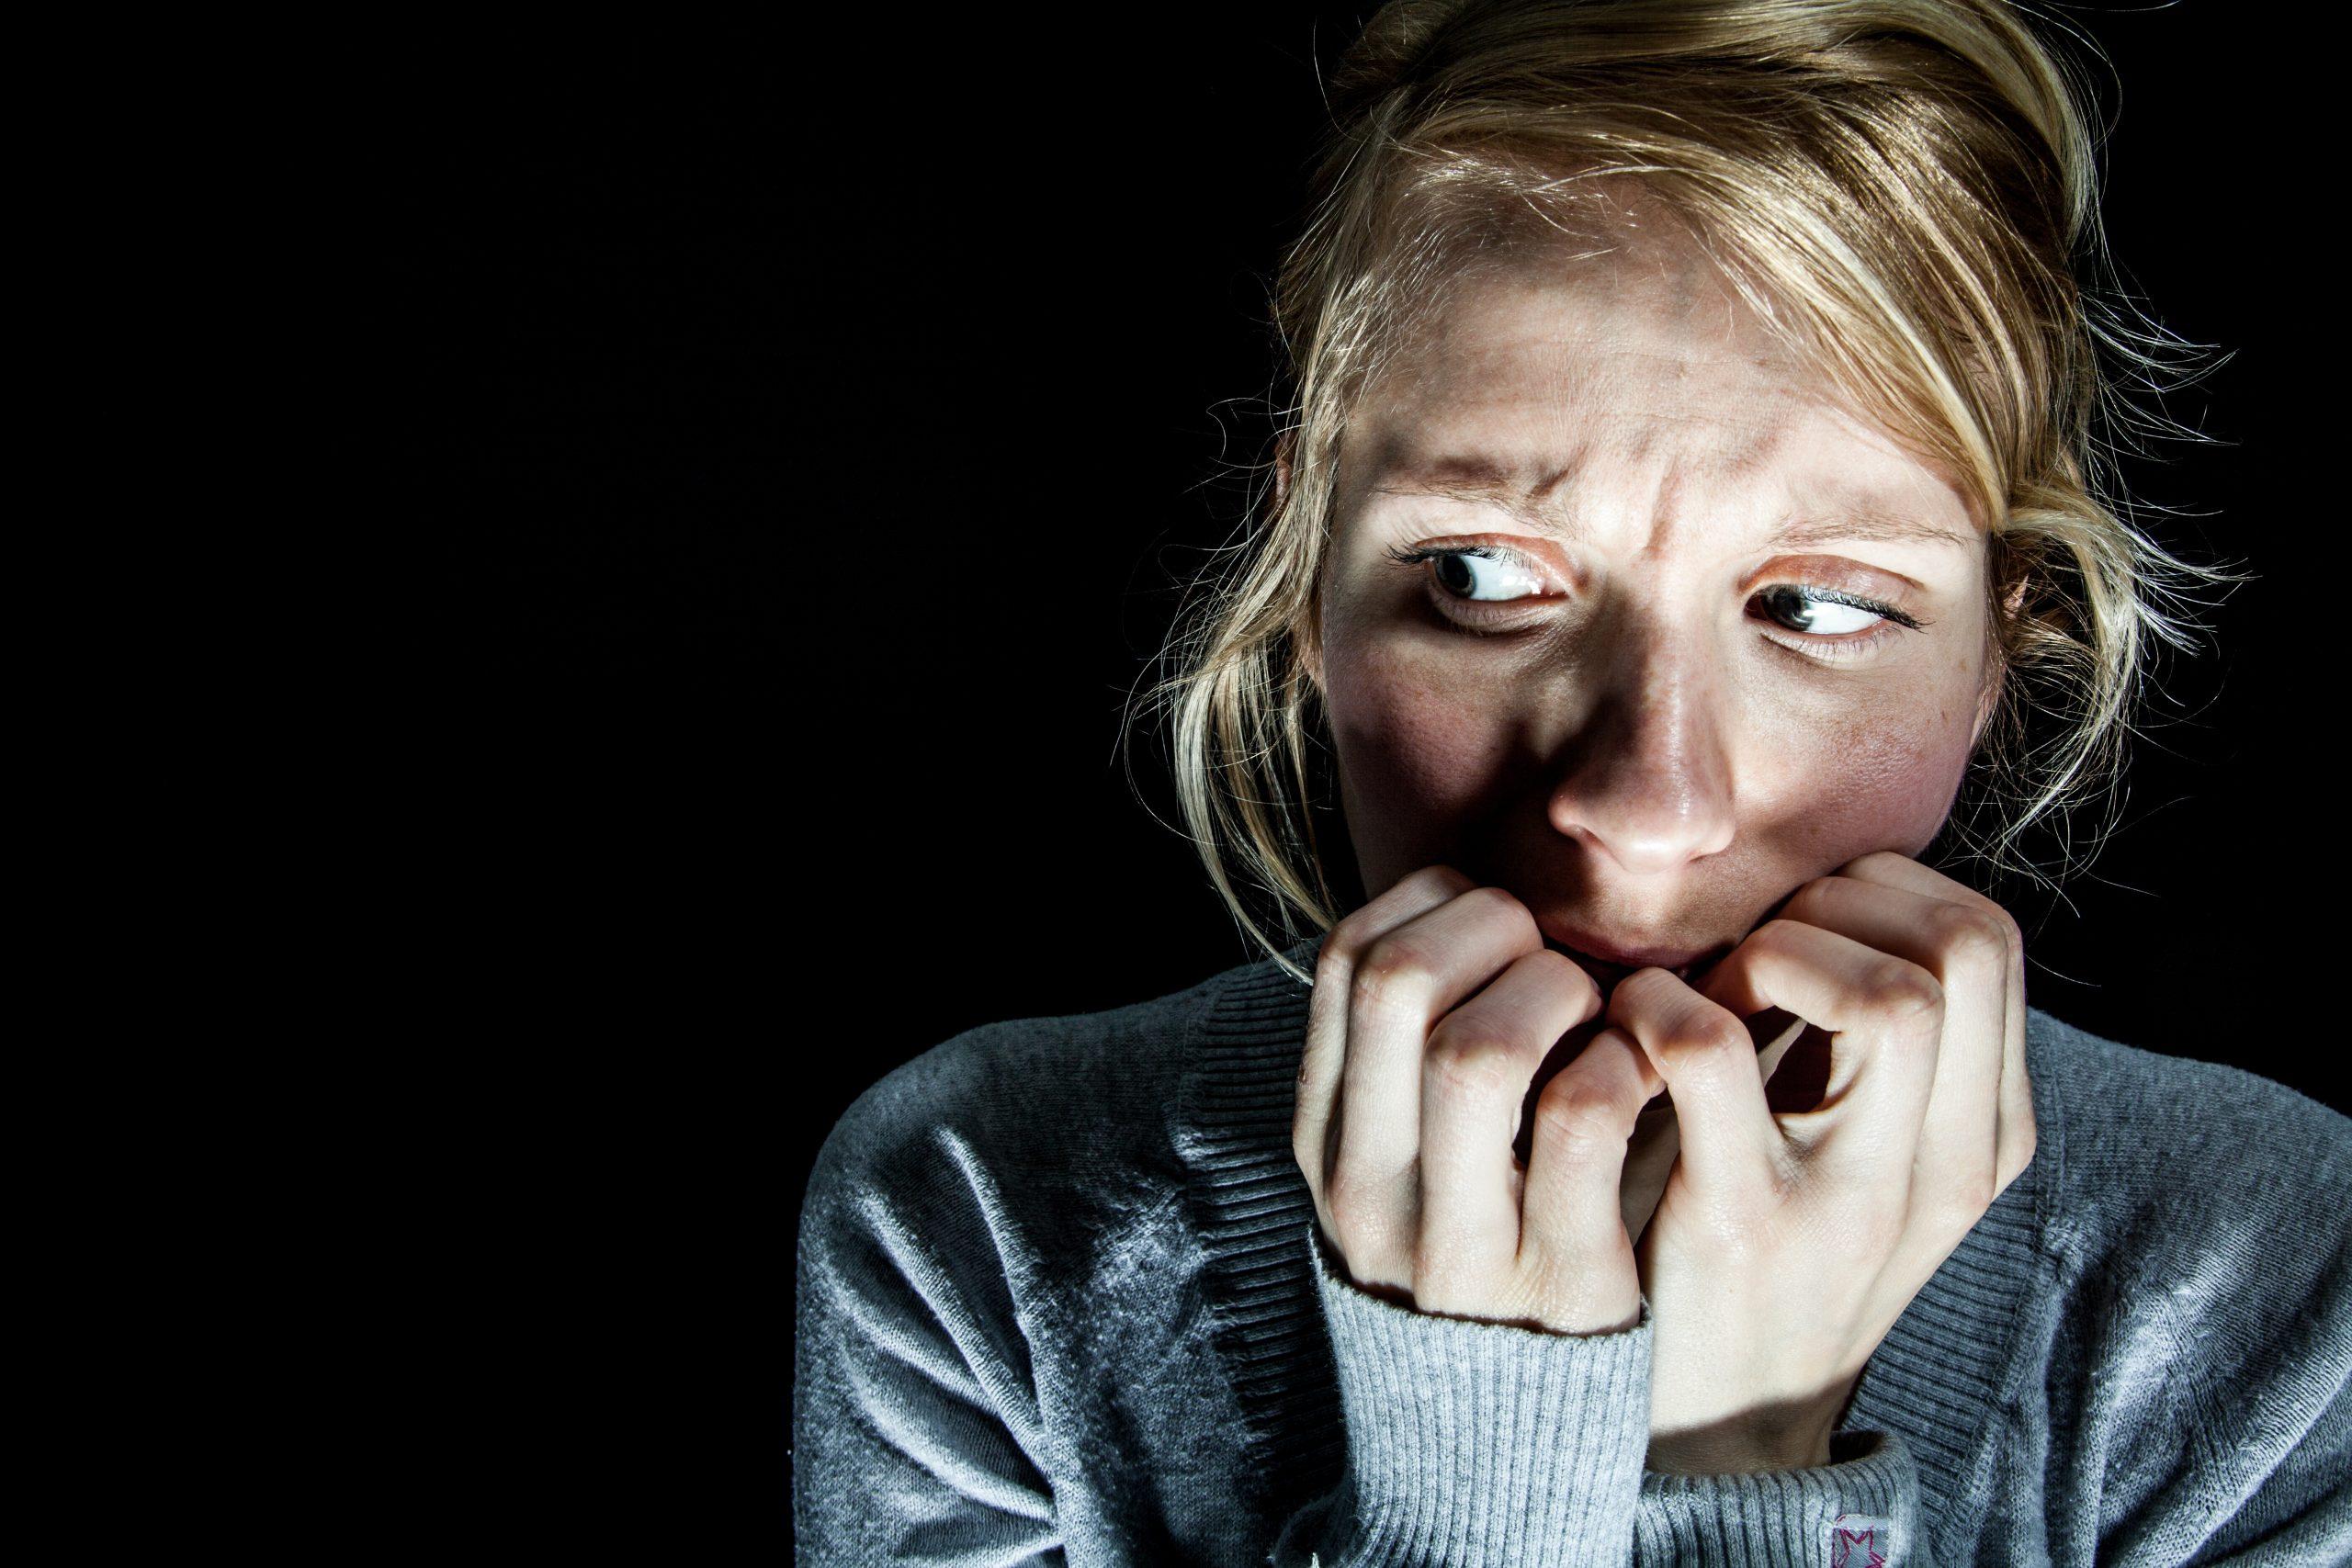 girl-frightened-image